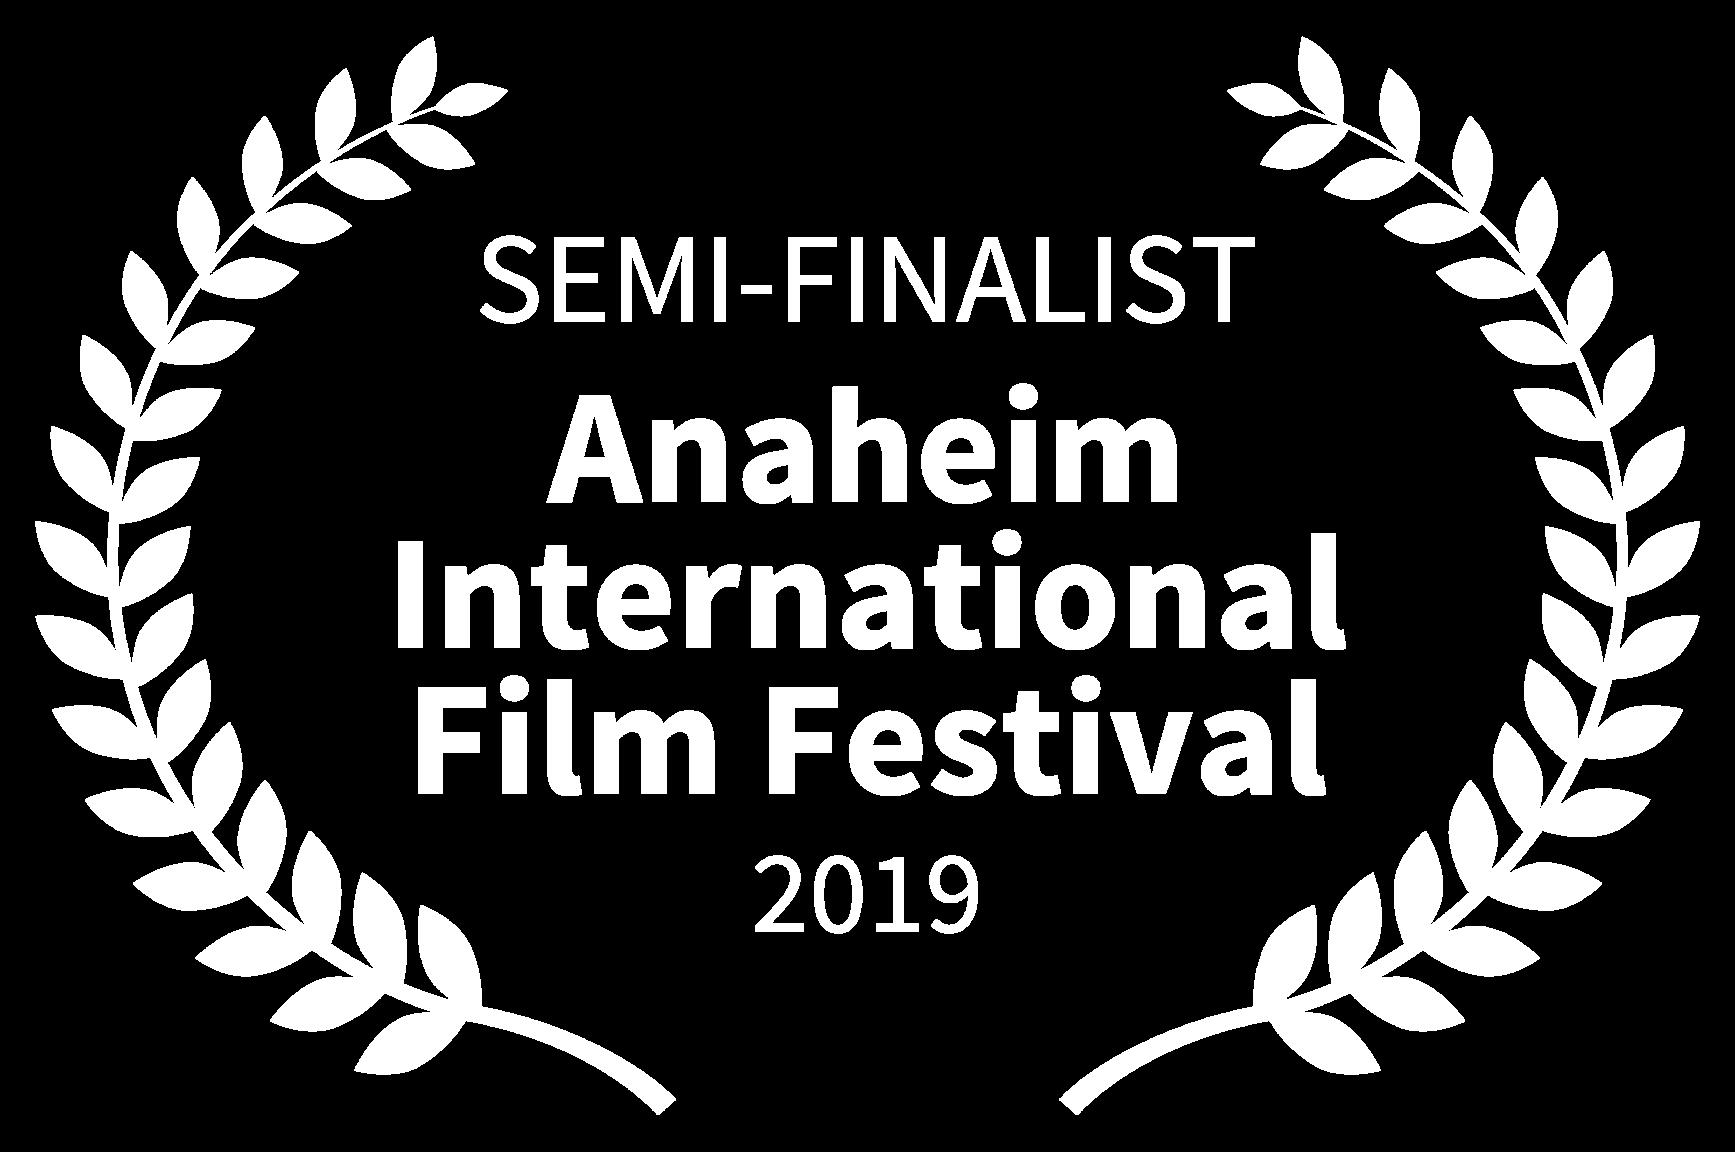 SEMI-FINALIST - Anaheim International Film Festival - 2019